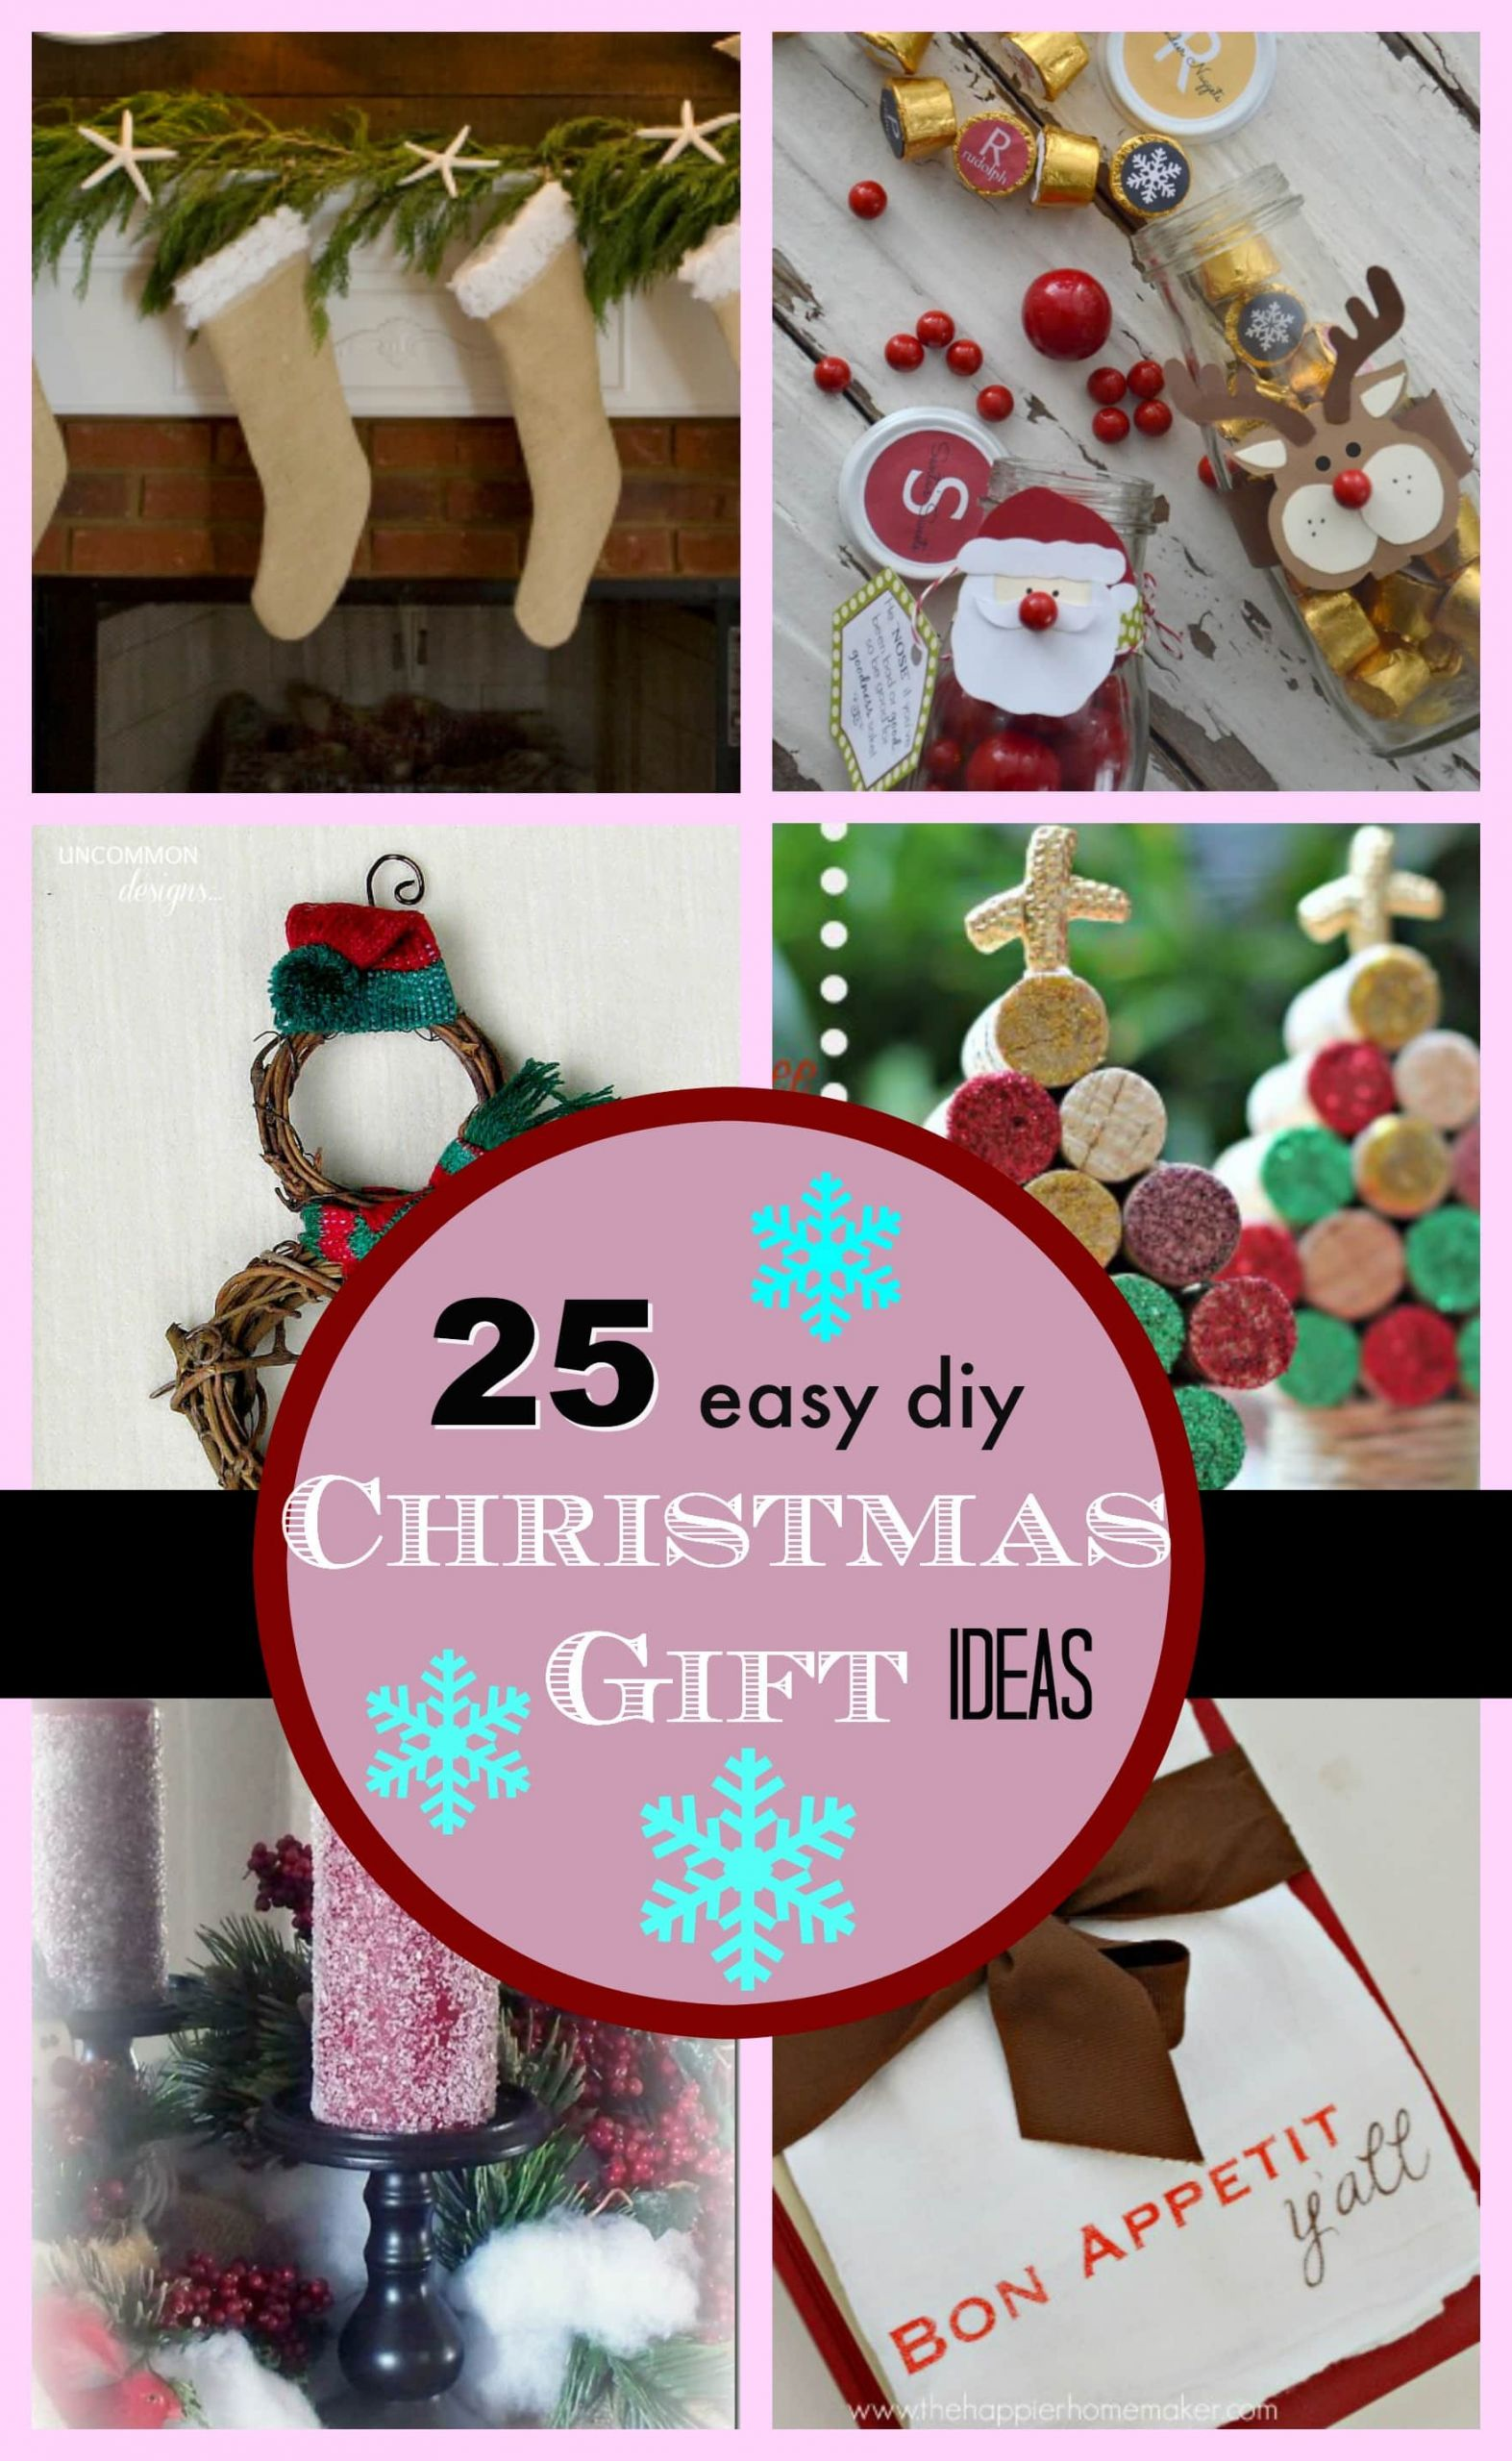 DIY Holiday Gift Ideas  25 DIY Easy Christmas Gift Ideas PinkWhen